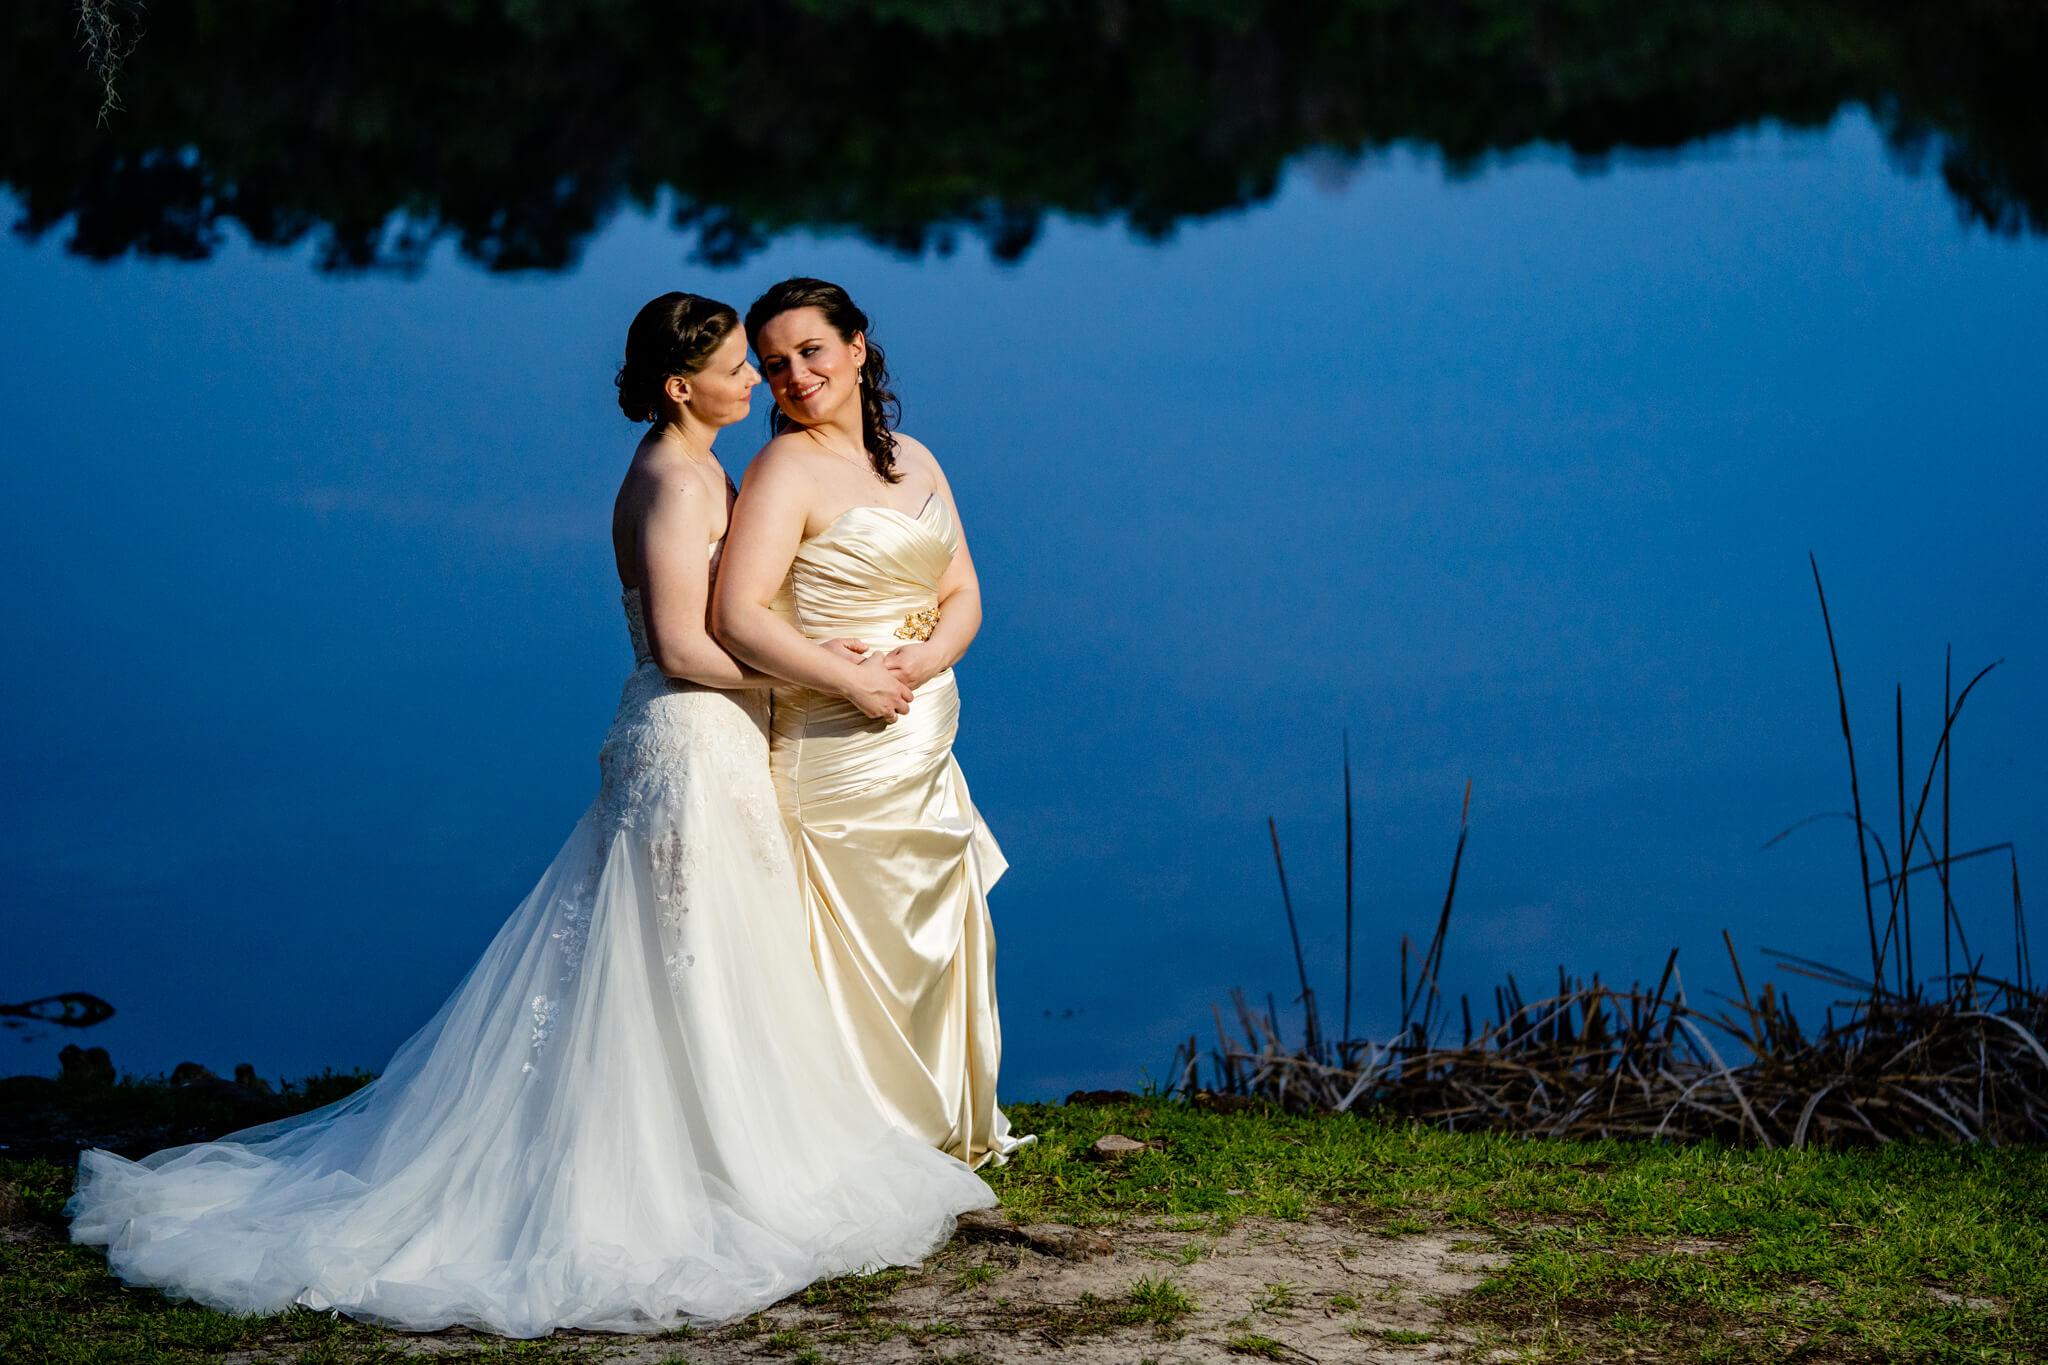 Catherine Laura University of Florida Wedding Smathers Library Reception Baughman Center Ceremony Lake Alice Wedding-31.jpg